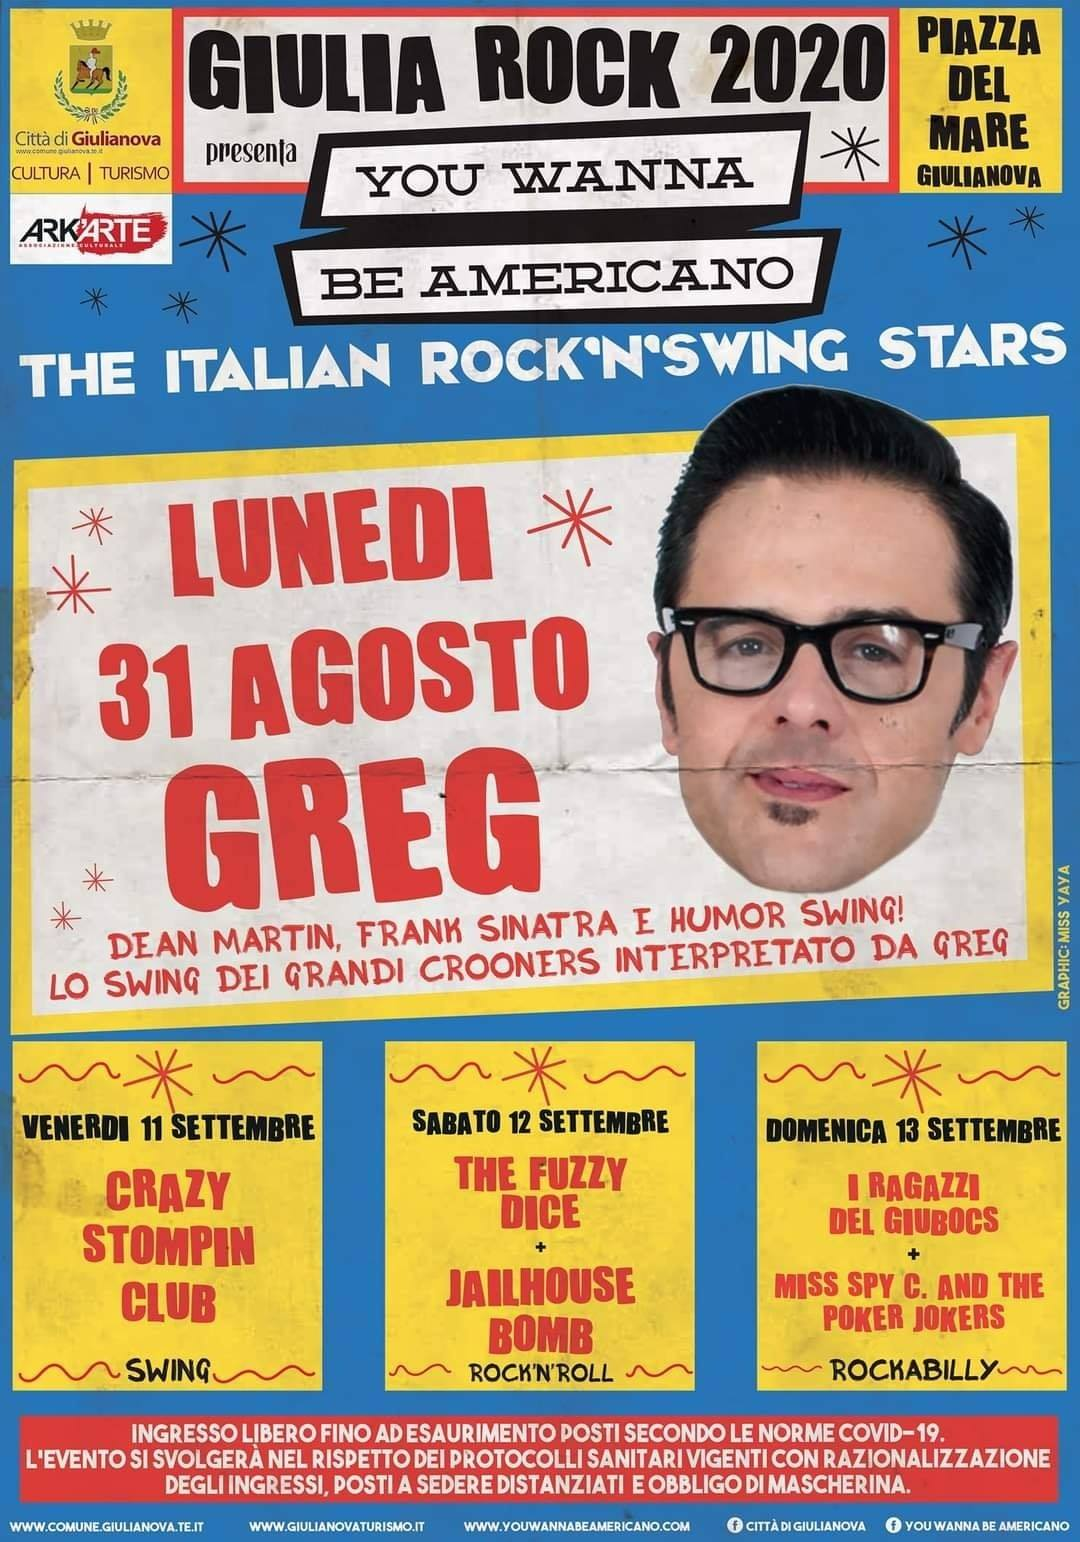 Giulia Rock 2020 - The Italian Rock\'n\'Swing Stars:  I Ragazzi del Giubocs + Miss Spy C. & the Poker Jokers